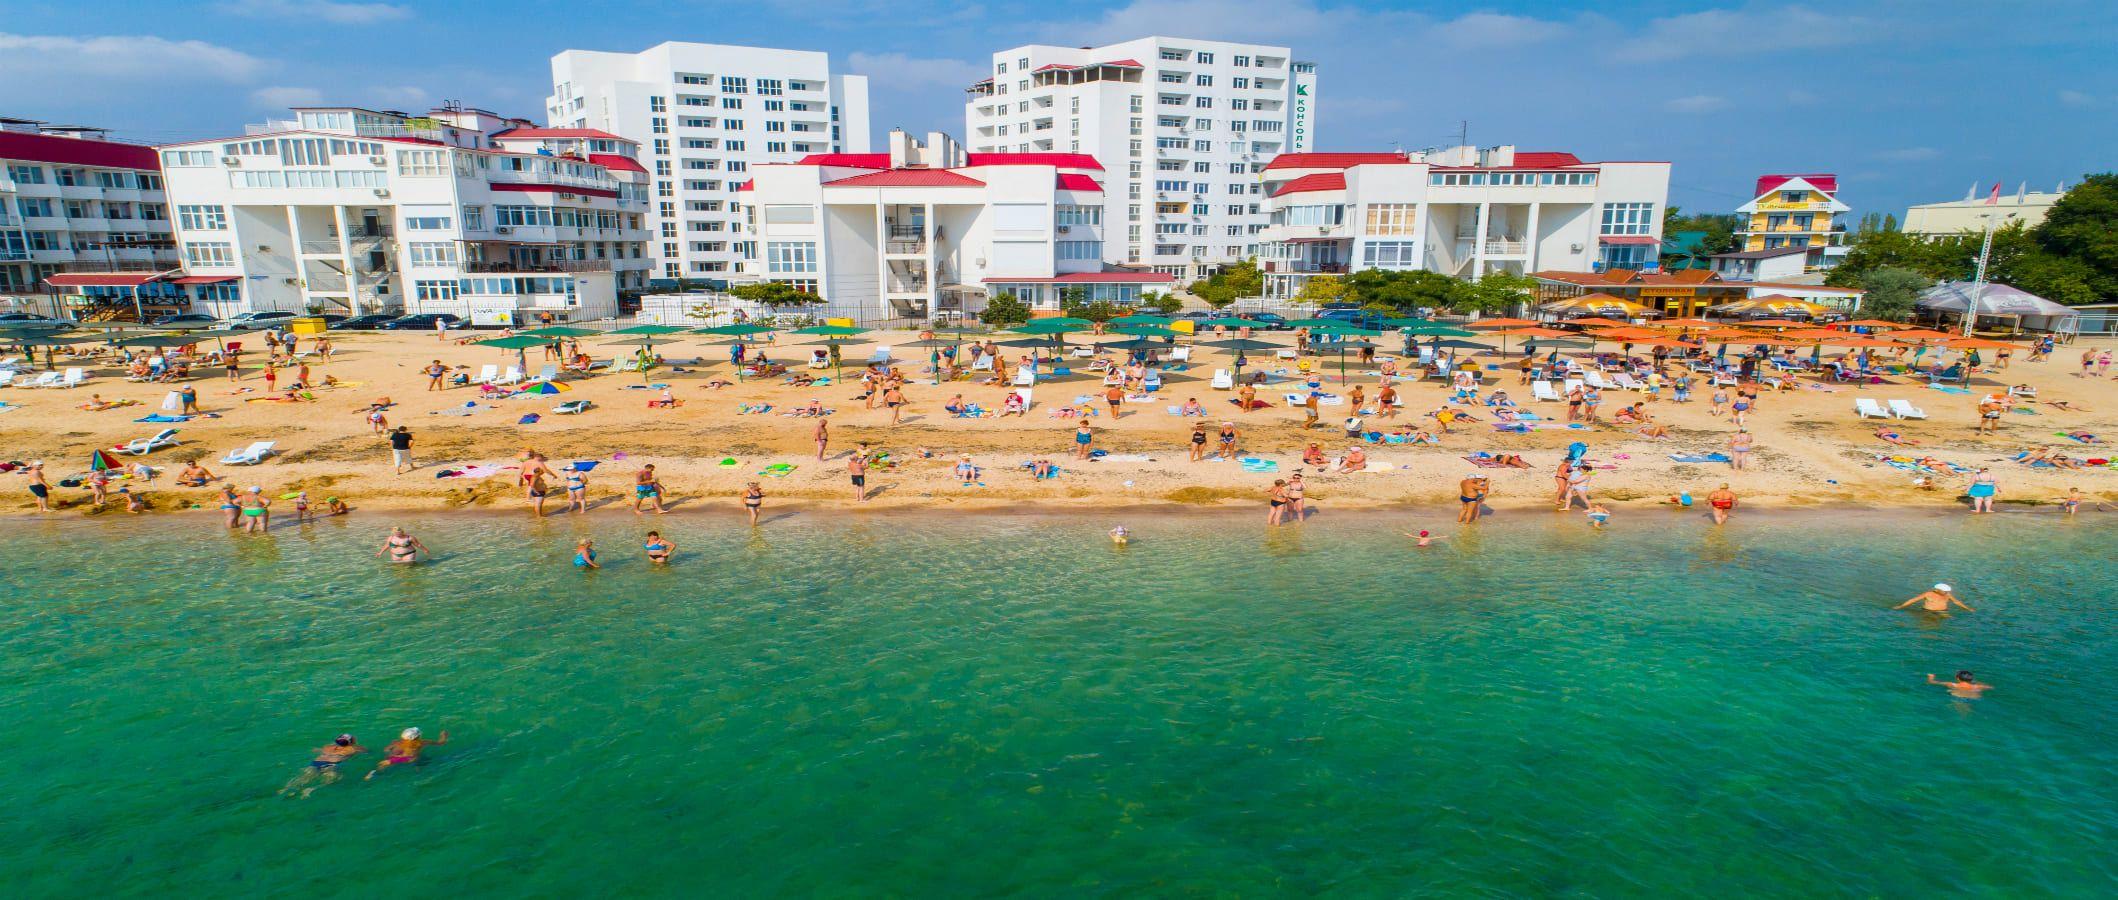 Двухкомнатные апартаменты (Феодосия|Крым)